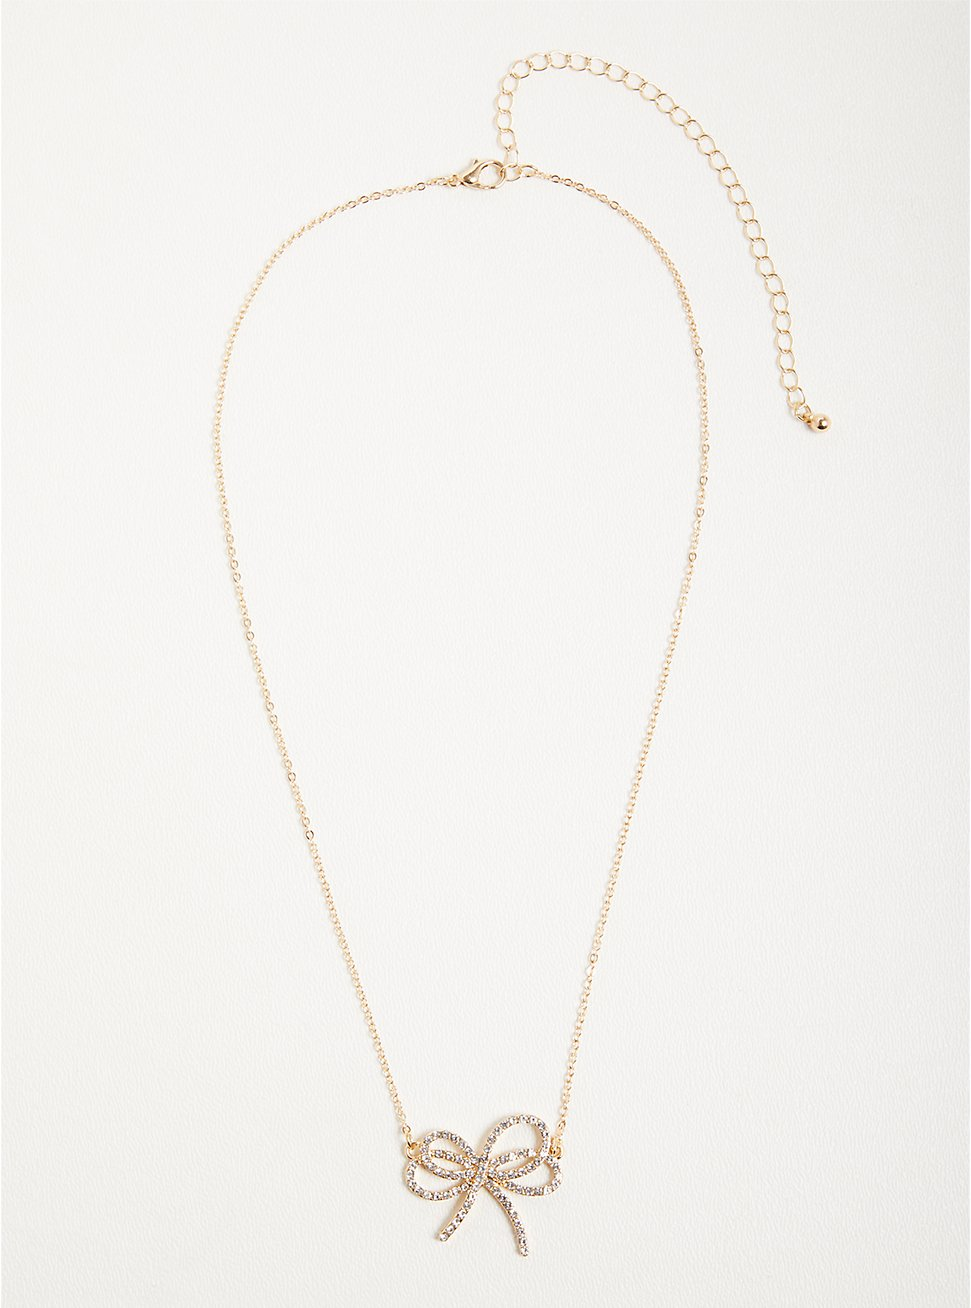 Rhinestone Bow Necklace - Gold Tone, , hi-res